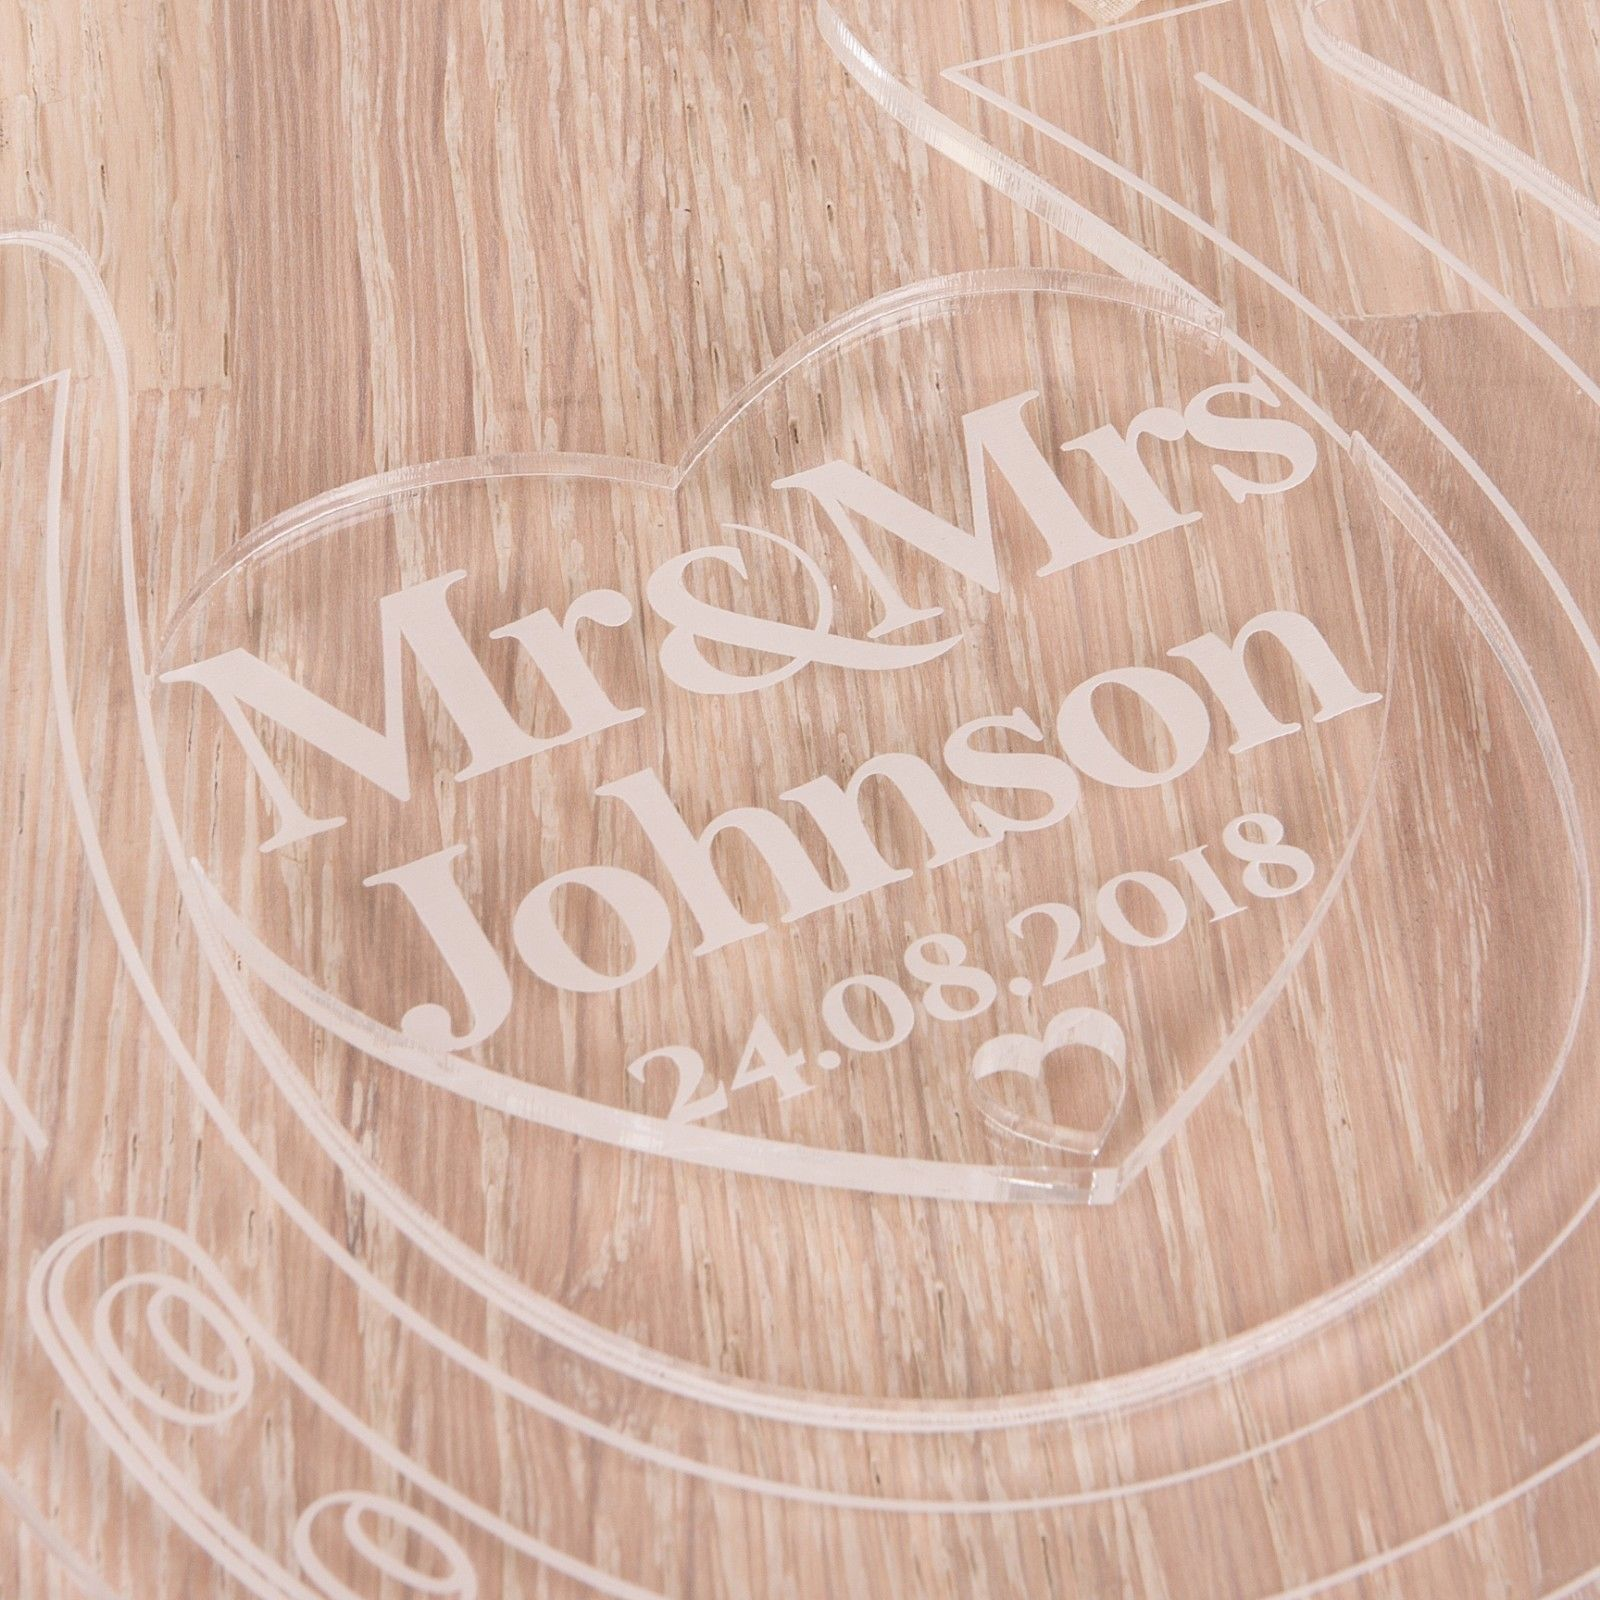 Little Gifts With Love - Personalised Acrylic Mr & Mrs Wedding Lucky Horseshoe Bridal Keepsake Gifts